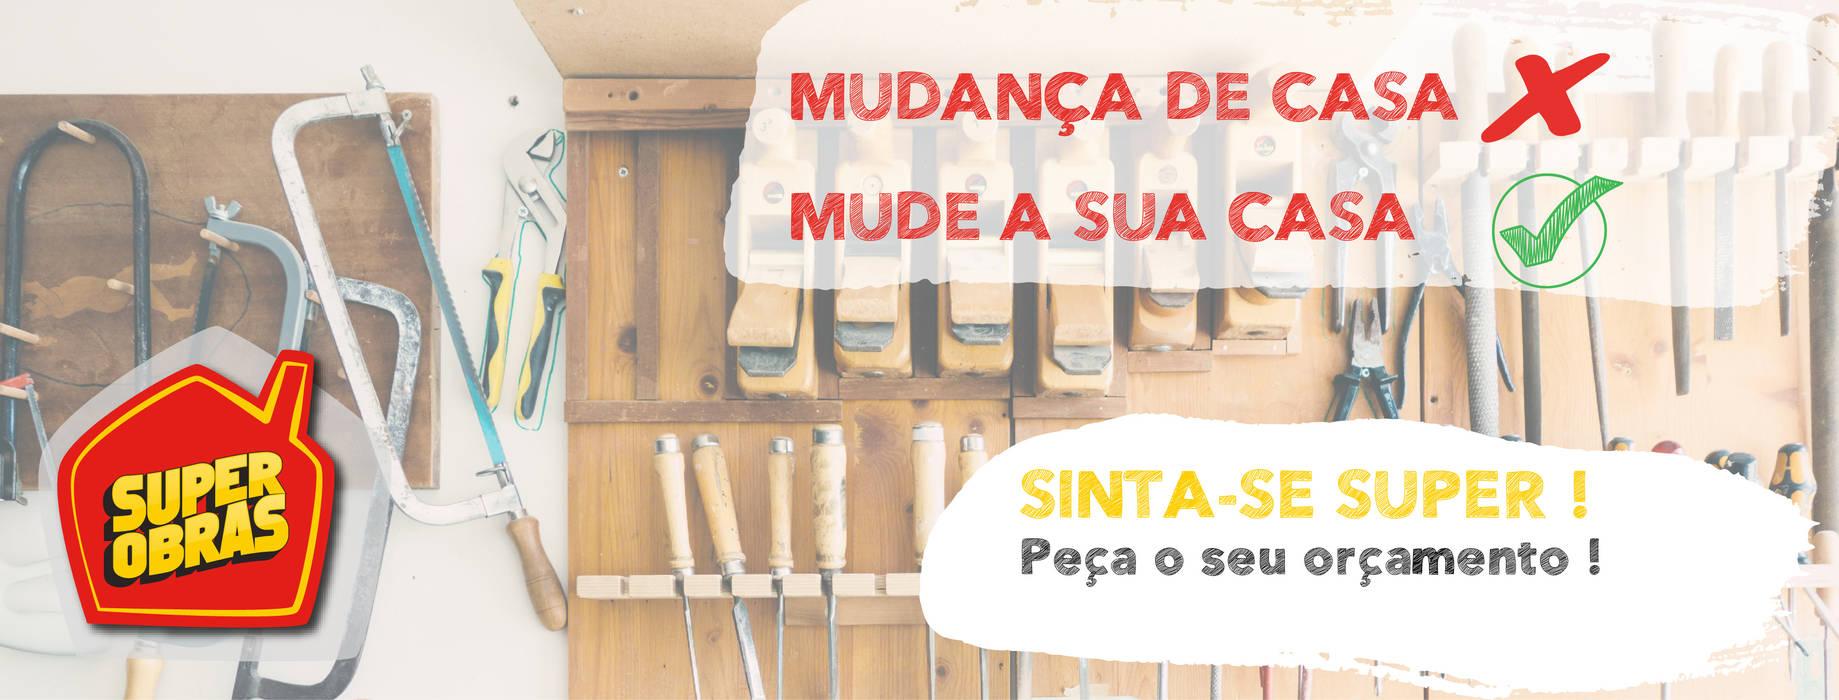 Casa de Banho Vilamoura (Algarve) Super Obras